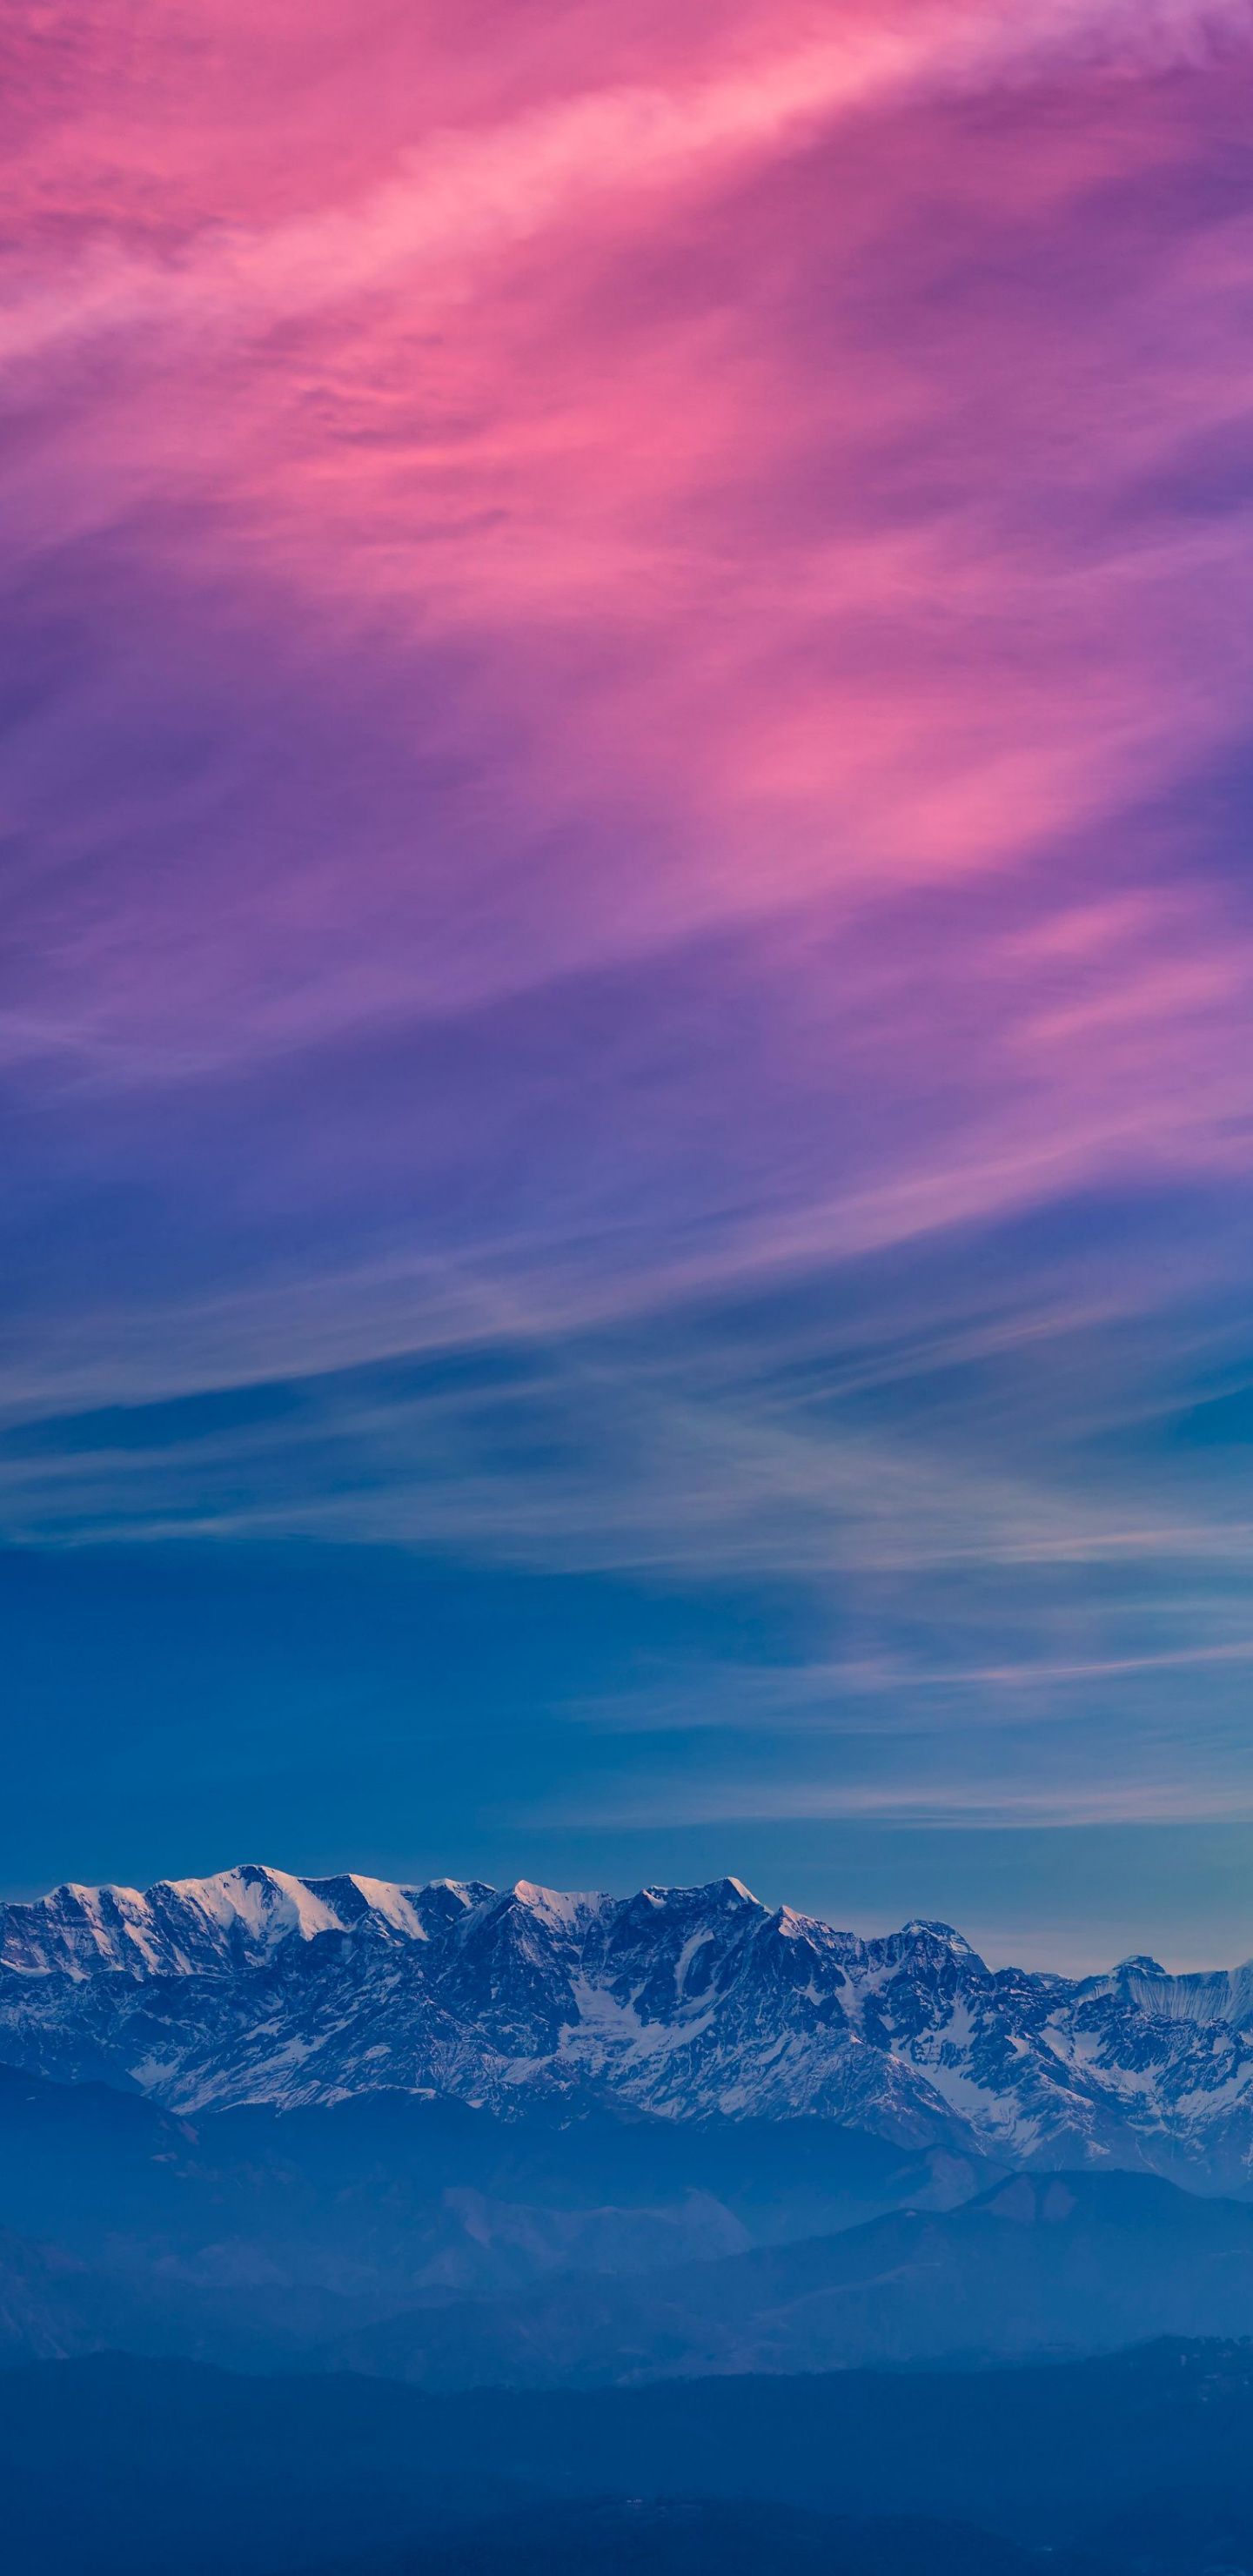 1440x2960 Horizon Blue Sky Mountains Fog Sunset Wallpaper Sunset Wallpaper Hd Nature Wallpapers Landscape Wallpaper